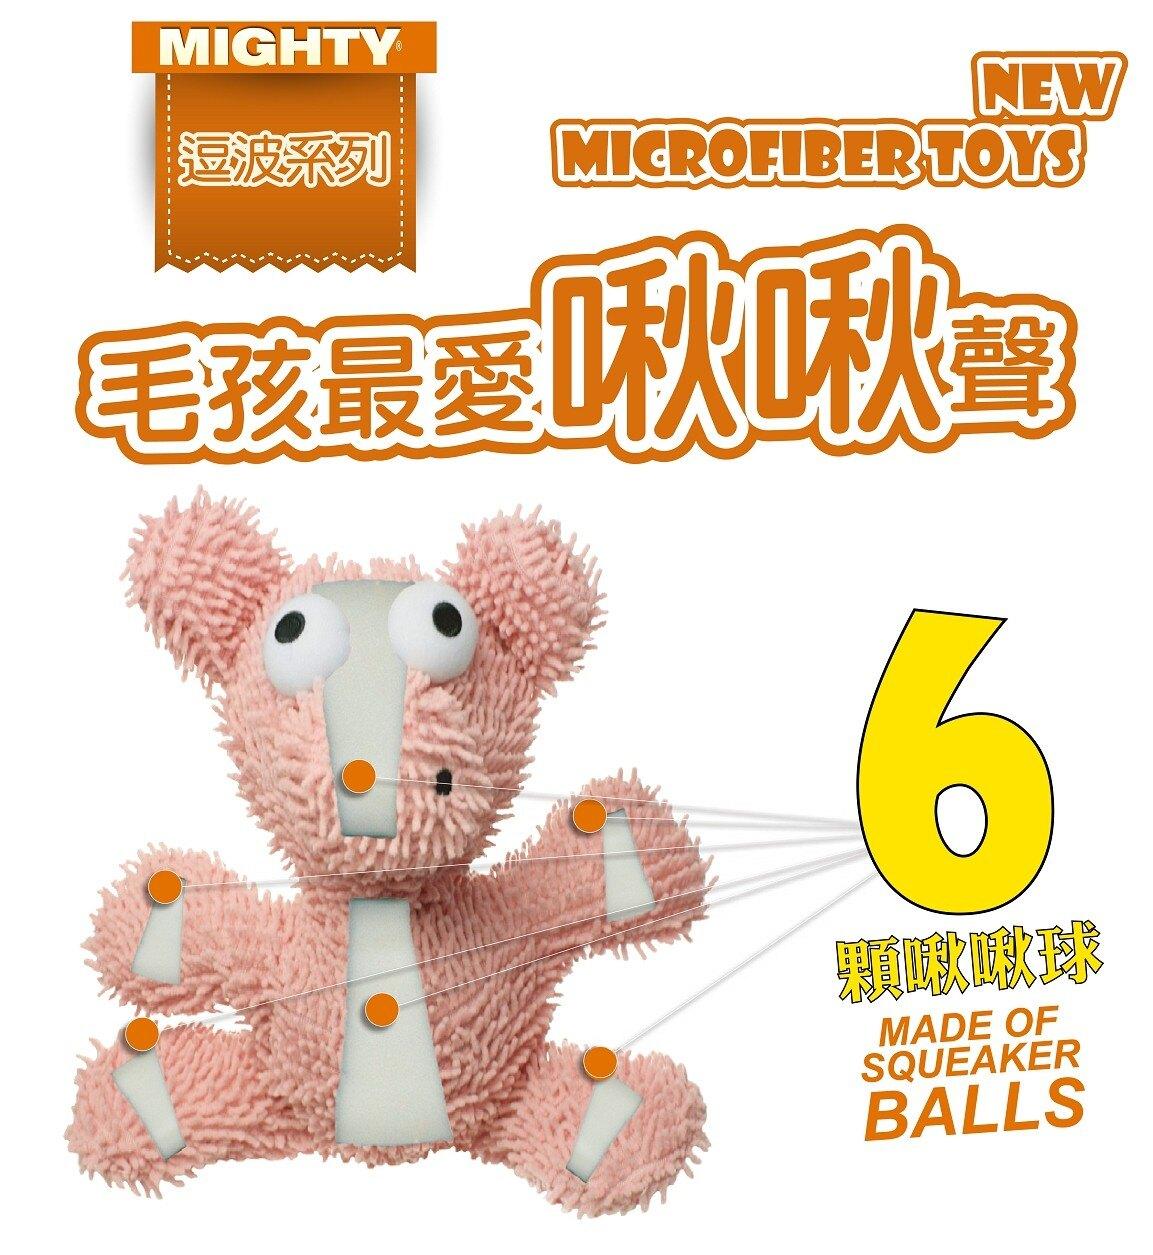 【TUFFY-狗玩具】MIGHTY- 逗波系列: 長頸鹿(中)